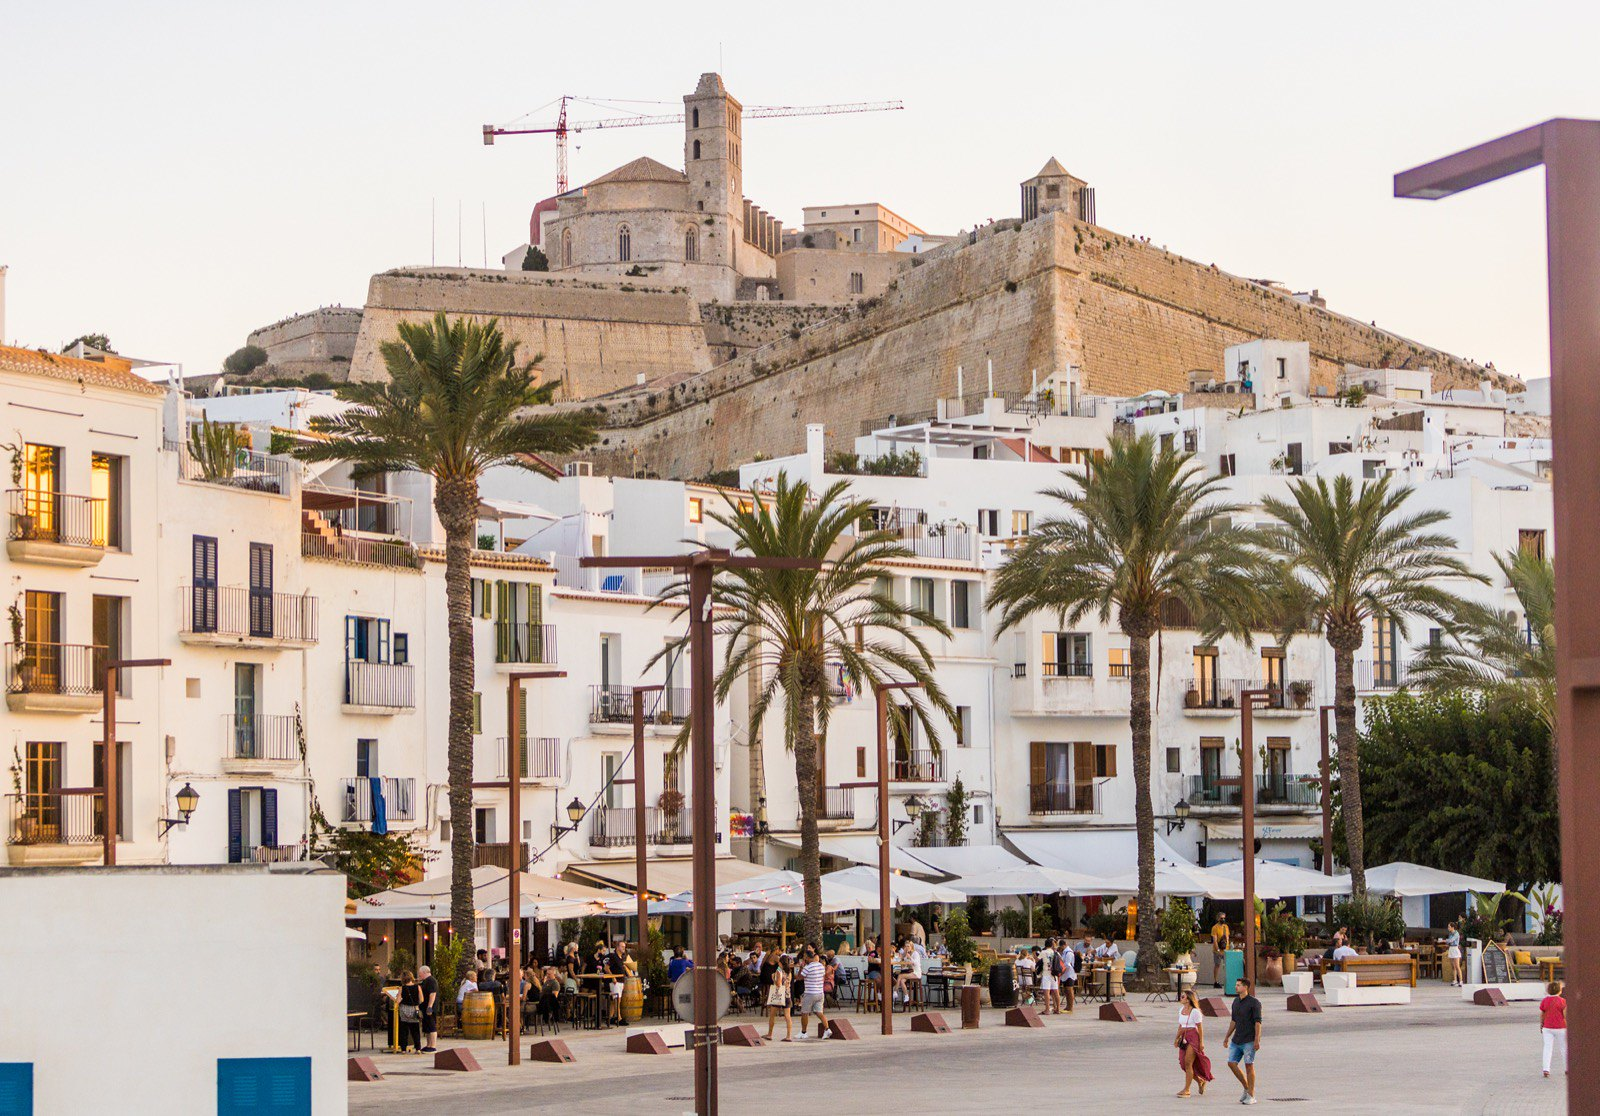 Where South American culture meets Ibiza soul